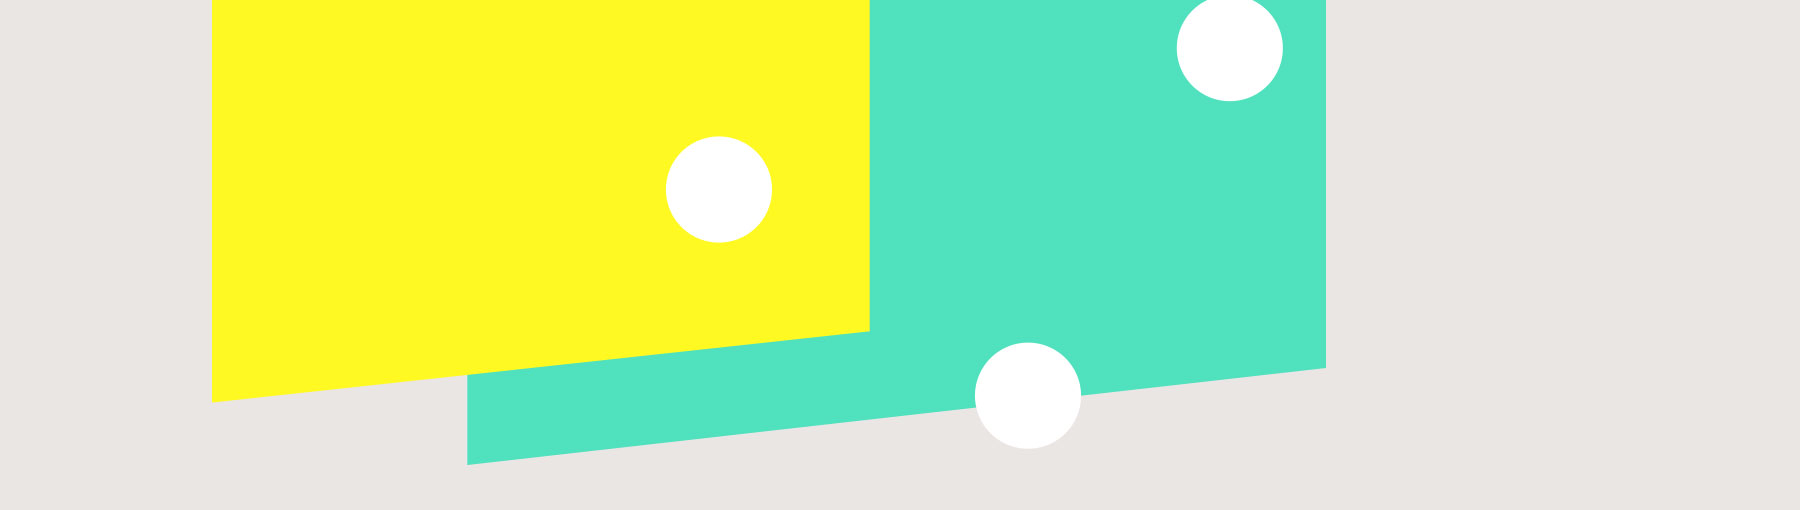 Slide-Home-FP-19